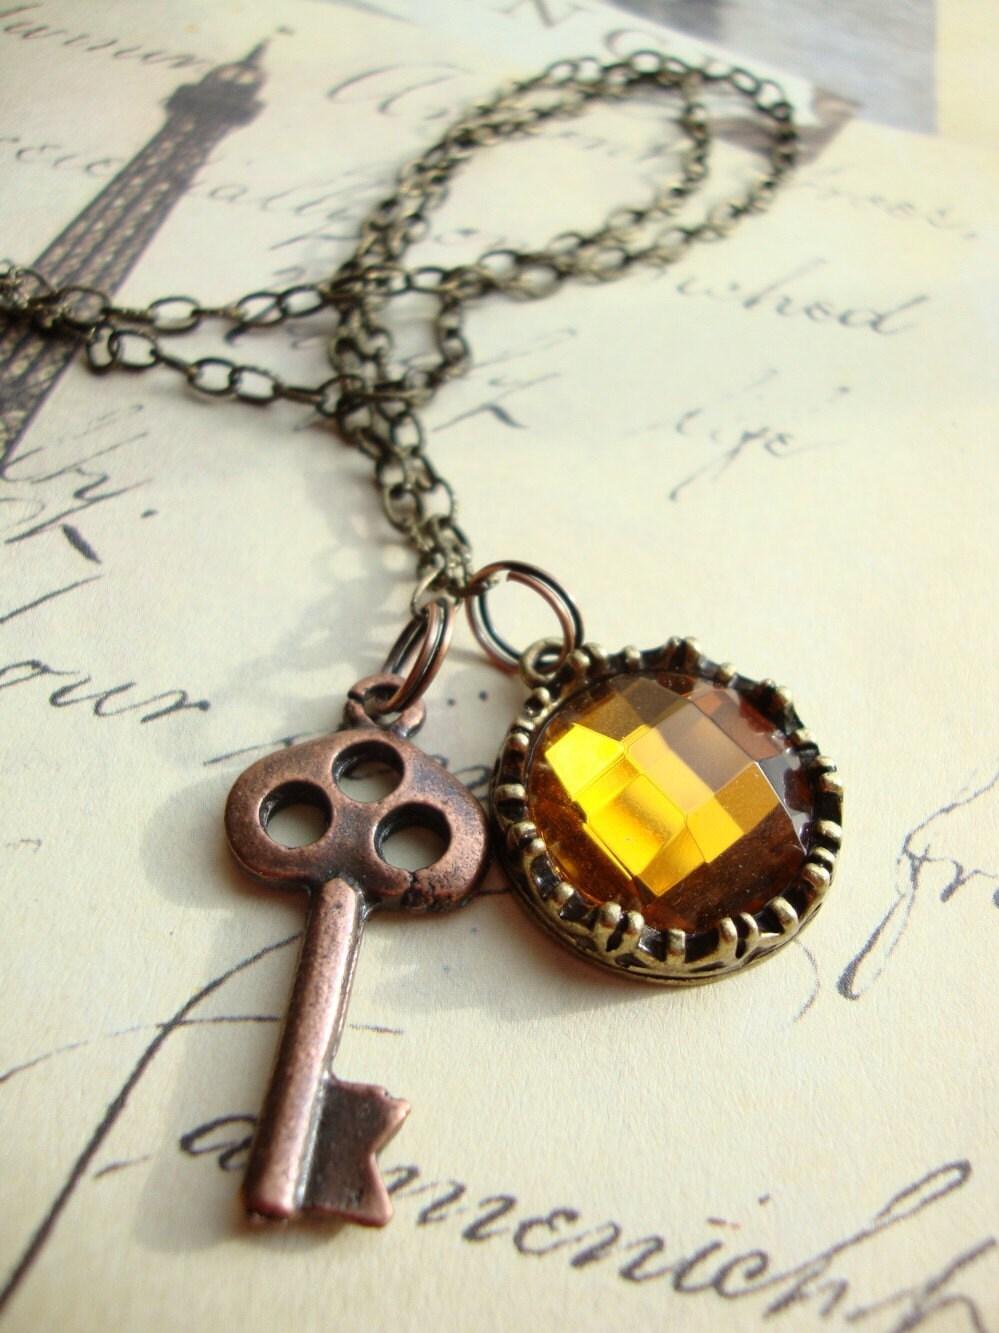 Copper Key and Amber Gem Vintage Inspired Necklace